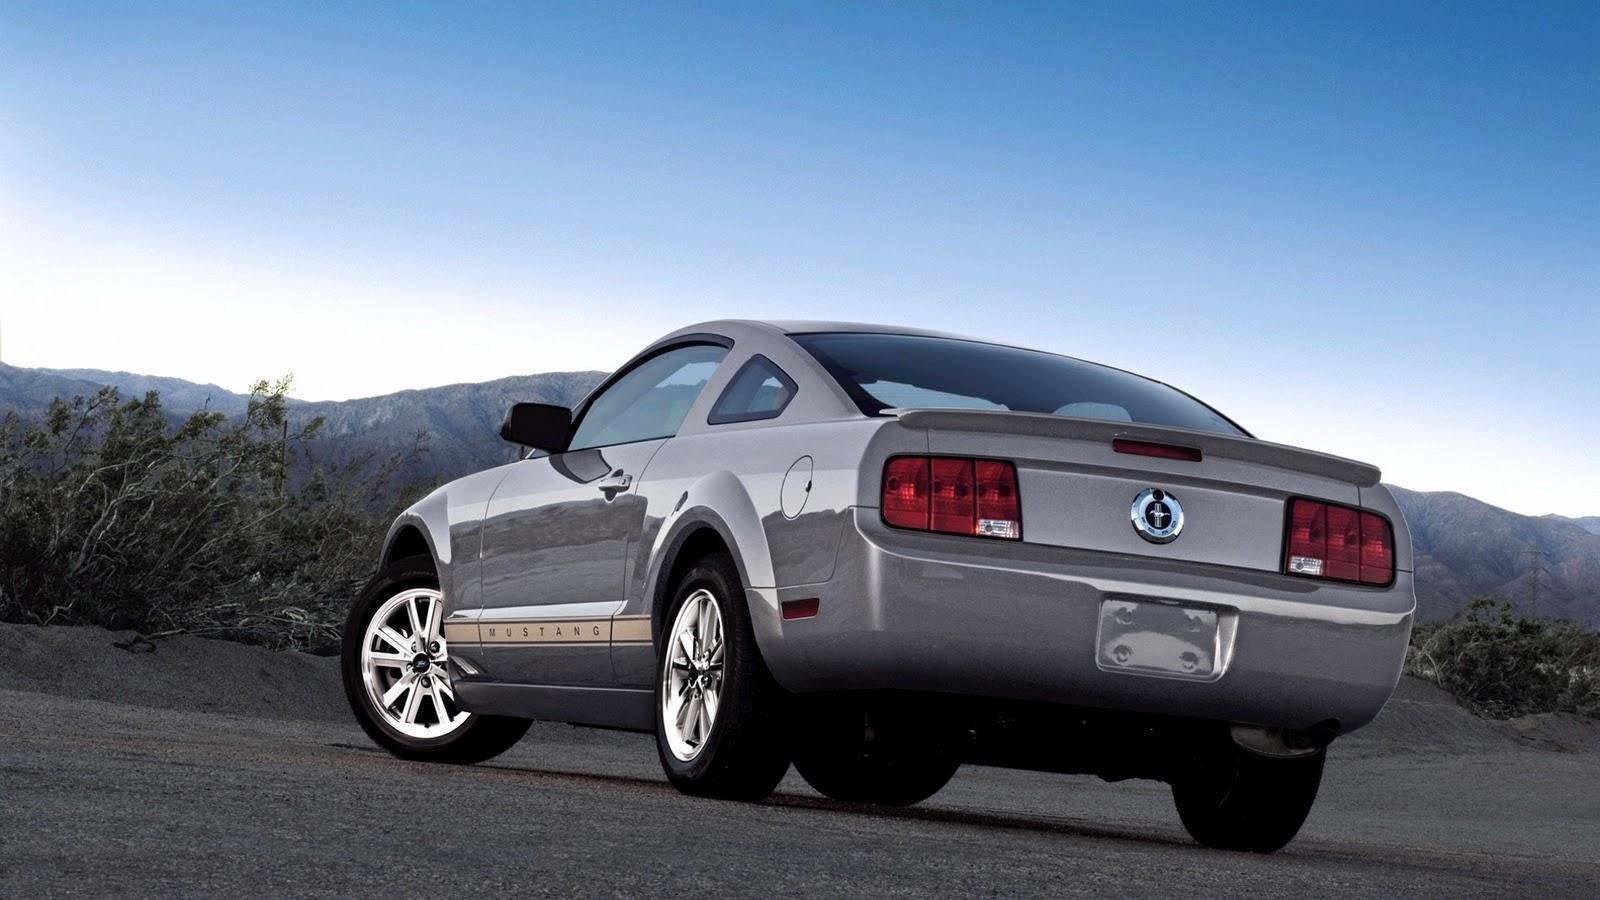 Wallpaper: 100 Ford Mustang Wallpapers 1080p, HD CAR WALLPAPER